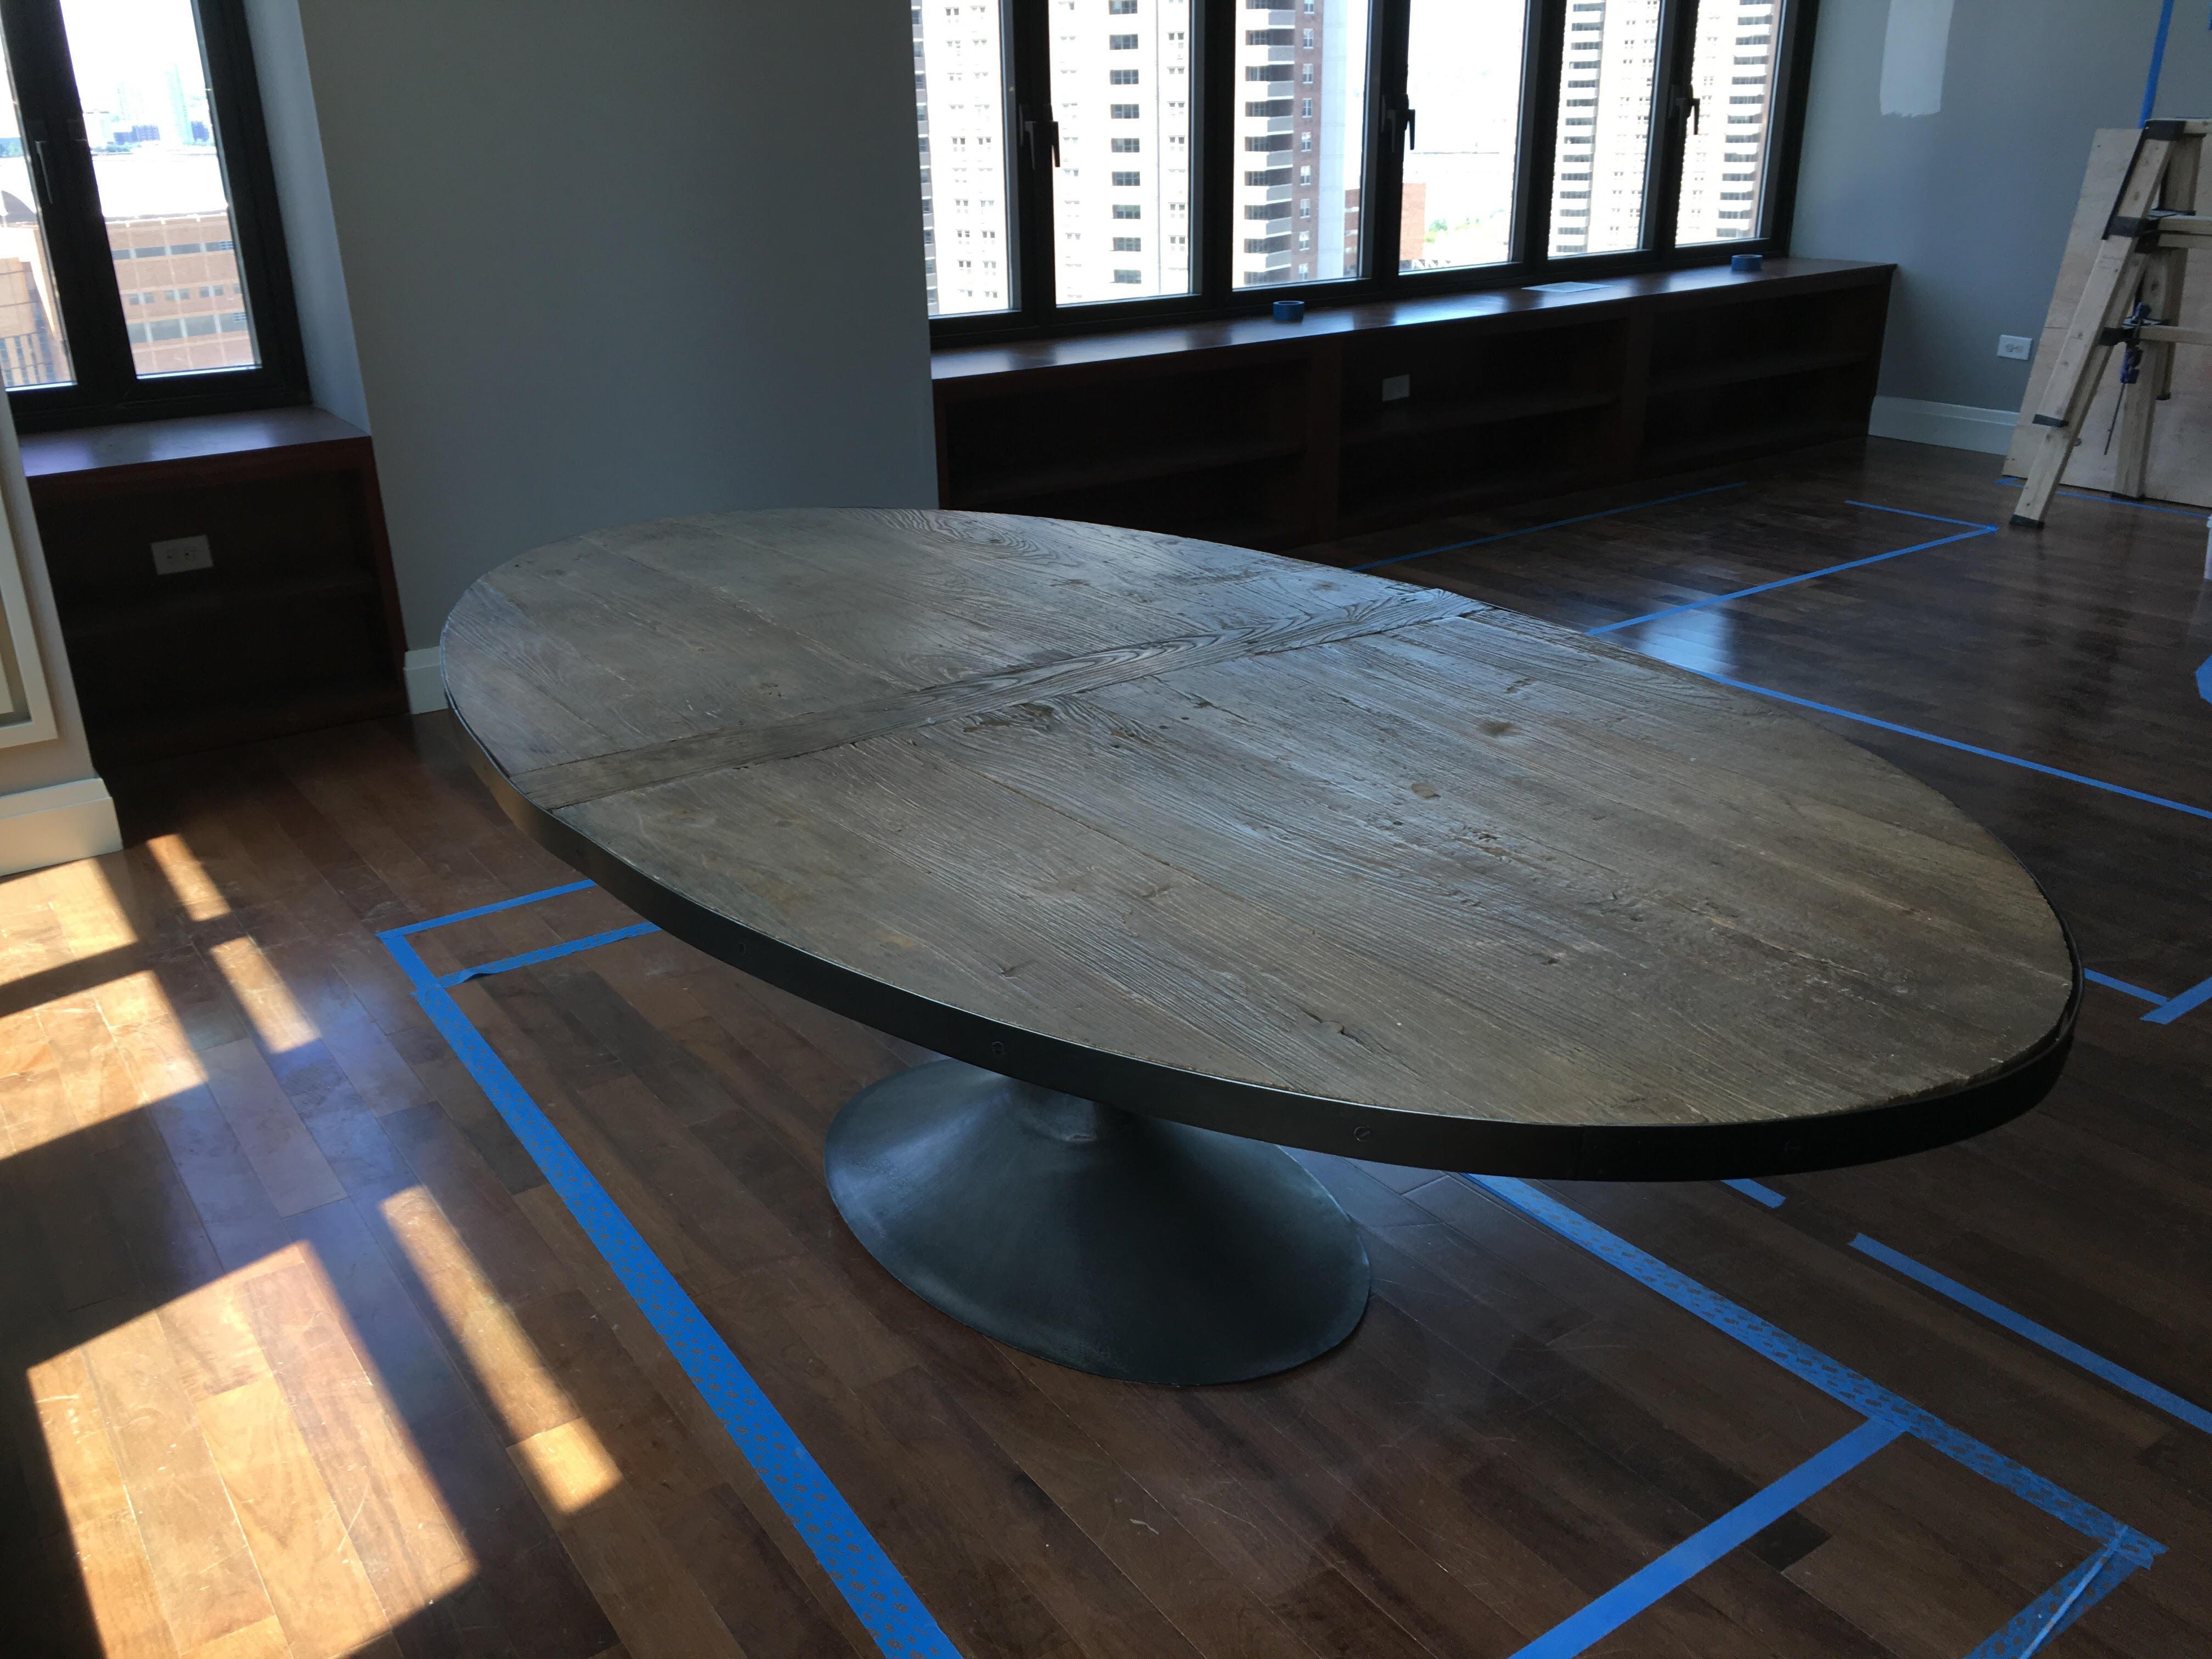 Reclaimed Wood Oval Dining Table eldesignrcom : restoration hardware aero reclaimed wood dining table 6107aspectfitampwidth640ampheight640 from eldesignr.com size 640 x 640 jpeg 43kB